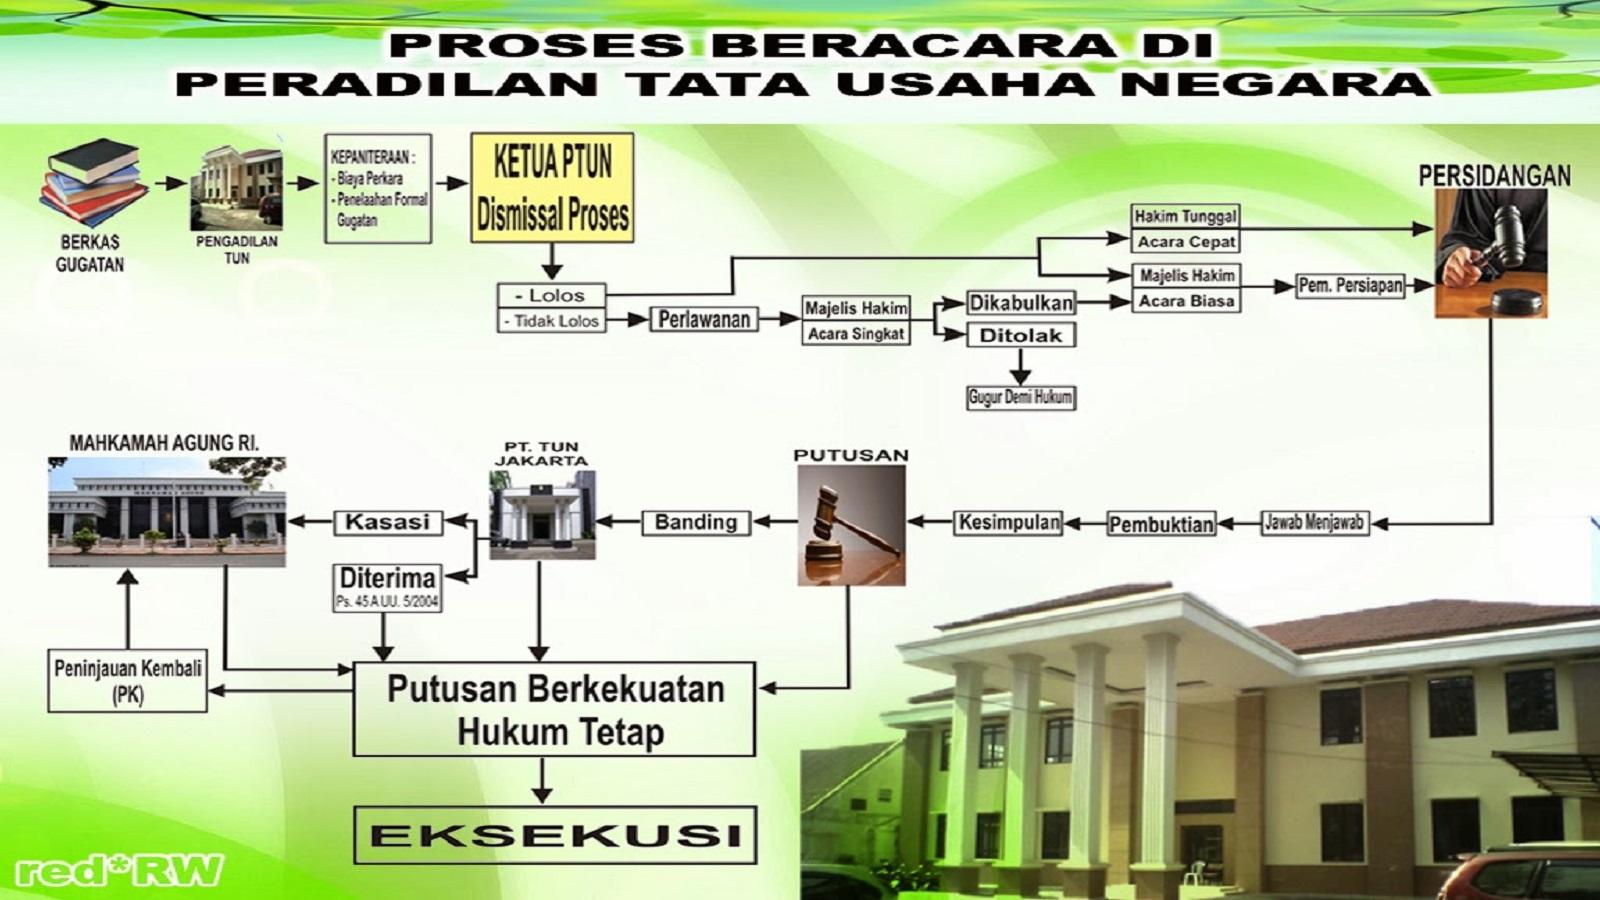 Tahapan dan Proses Beracara Pada Peradilan Tata Usaha Negara